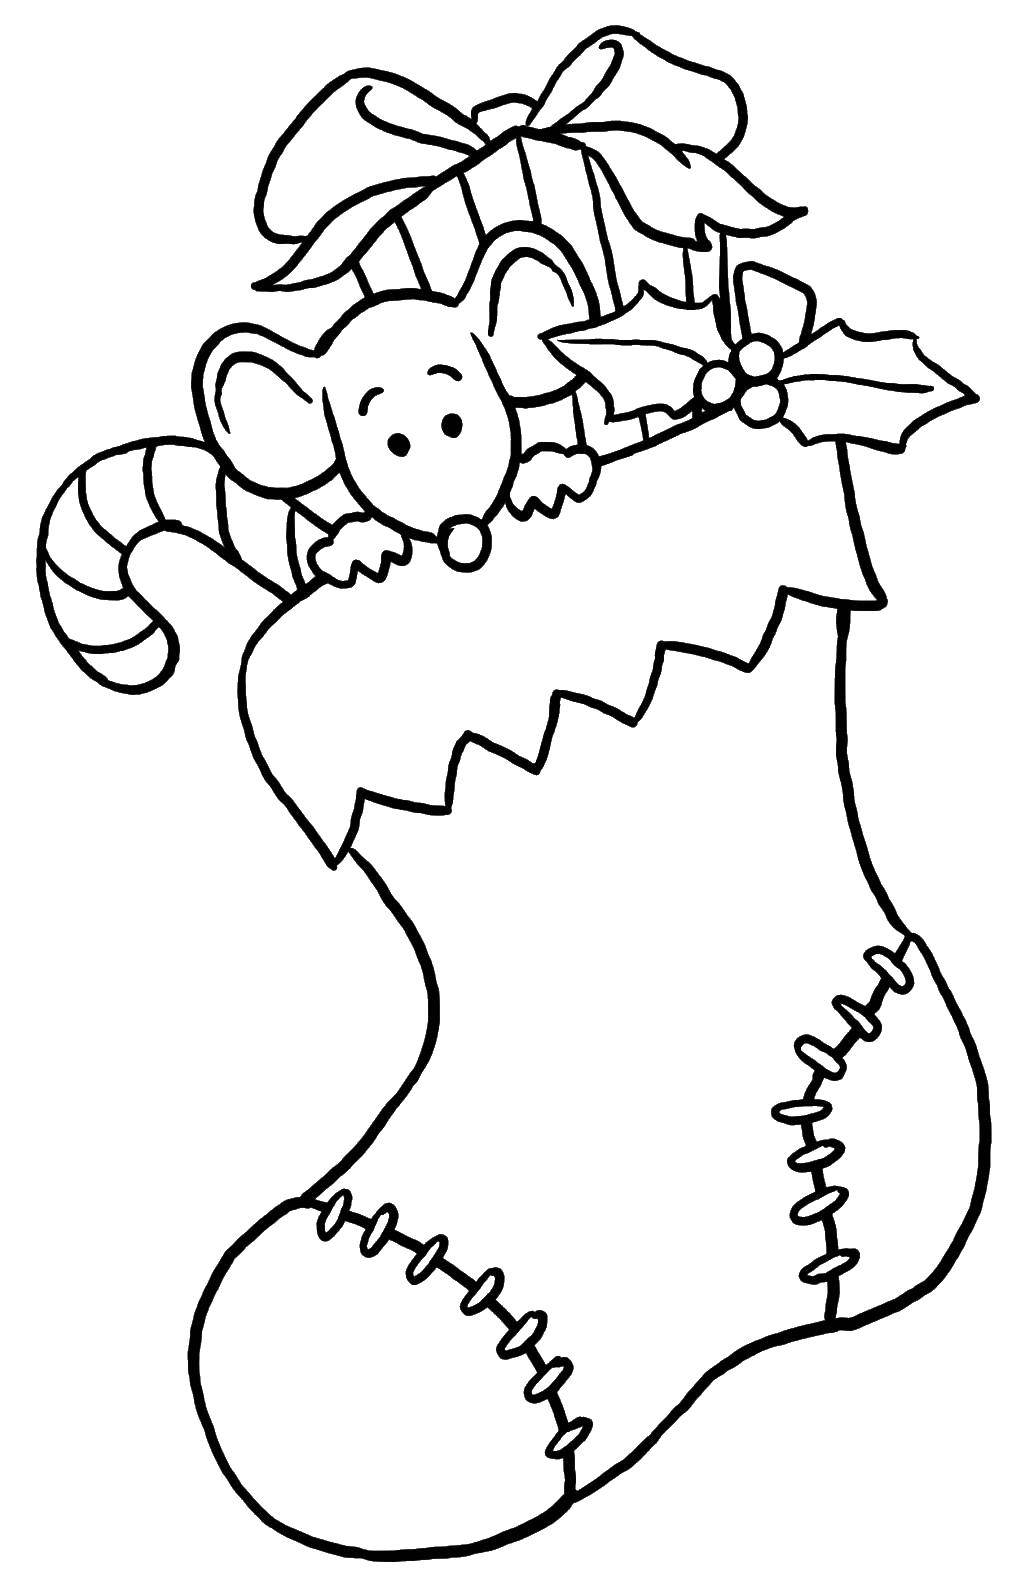 Название: Раскраска Мышка в носке. Категория: Рождество. Теги: Рождество, ёлочная игрушка, ёлка, подарки.